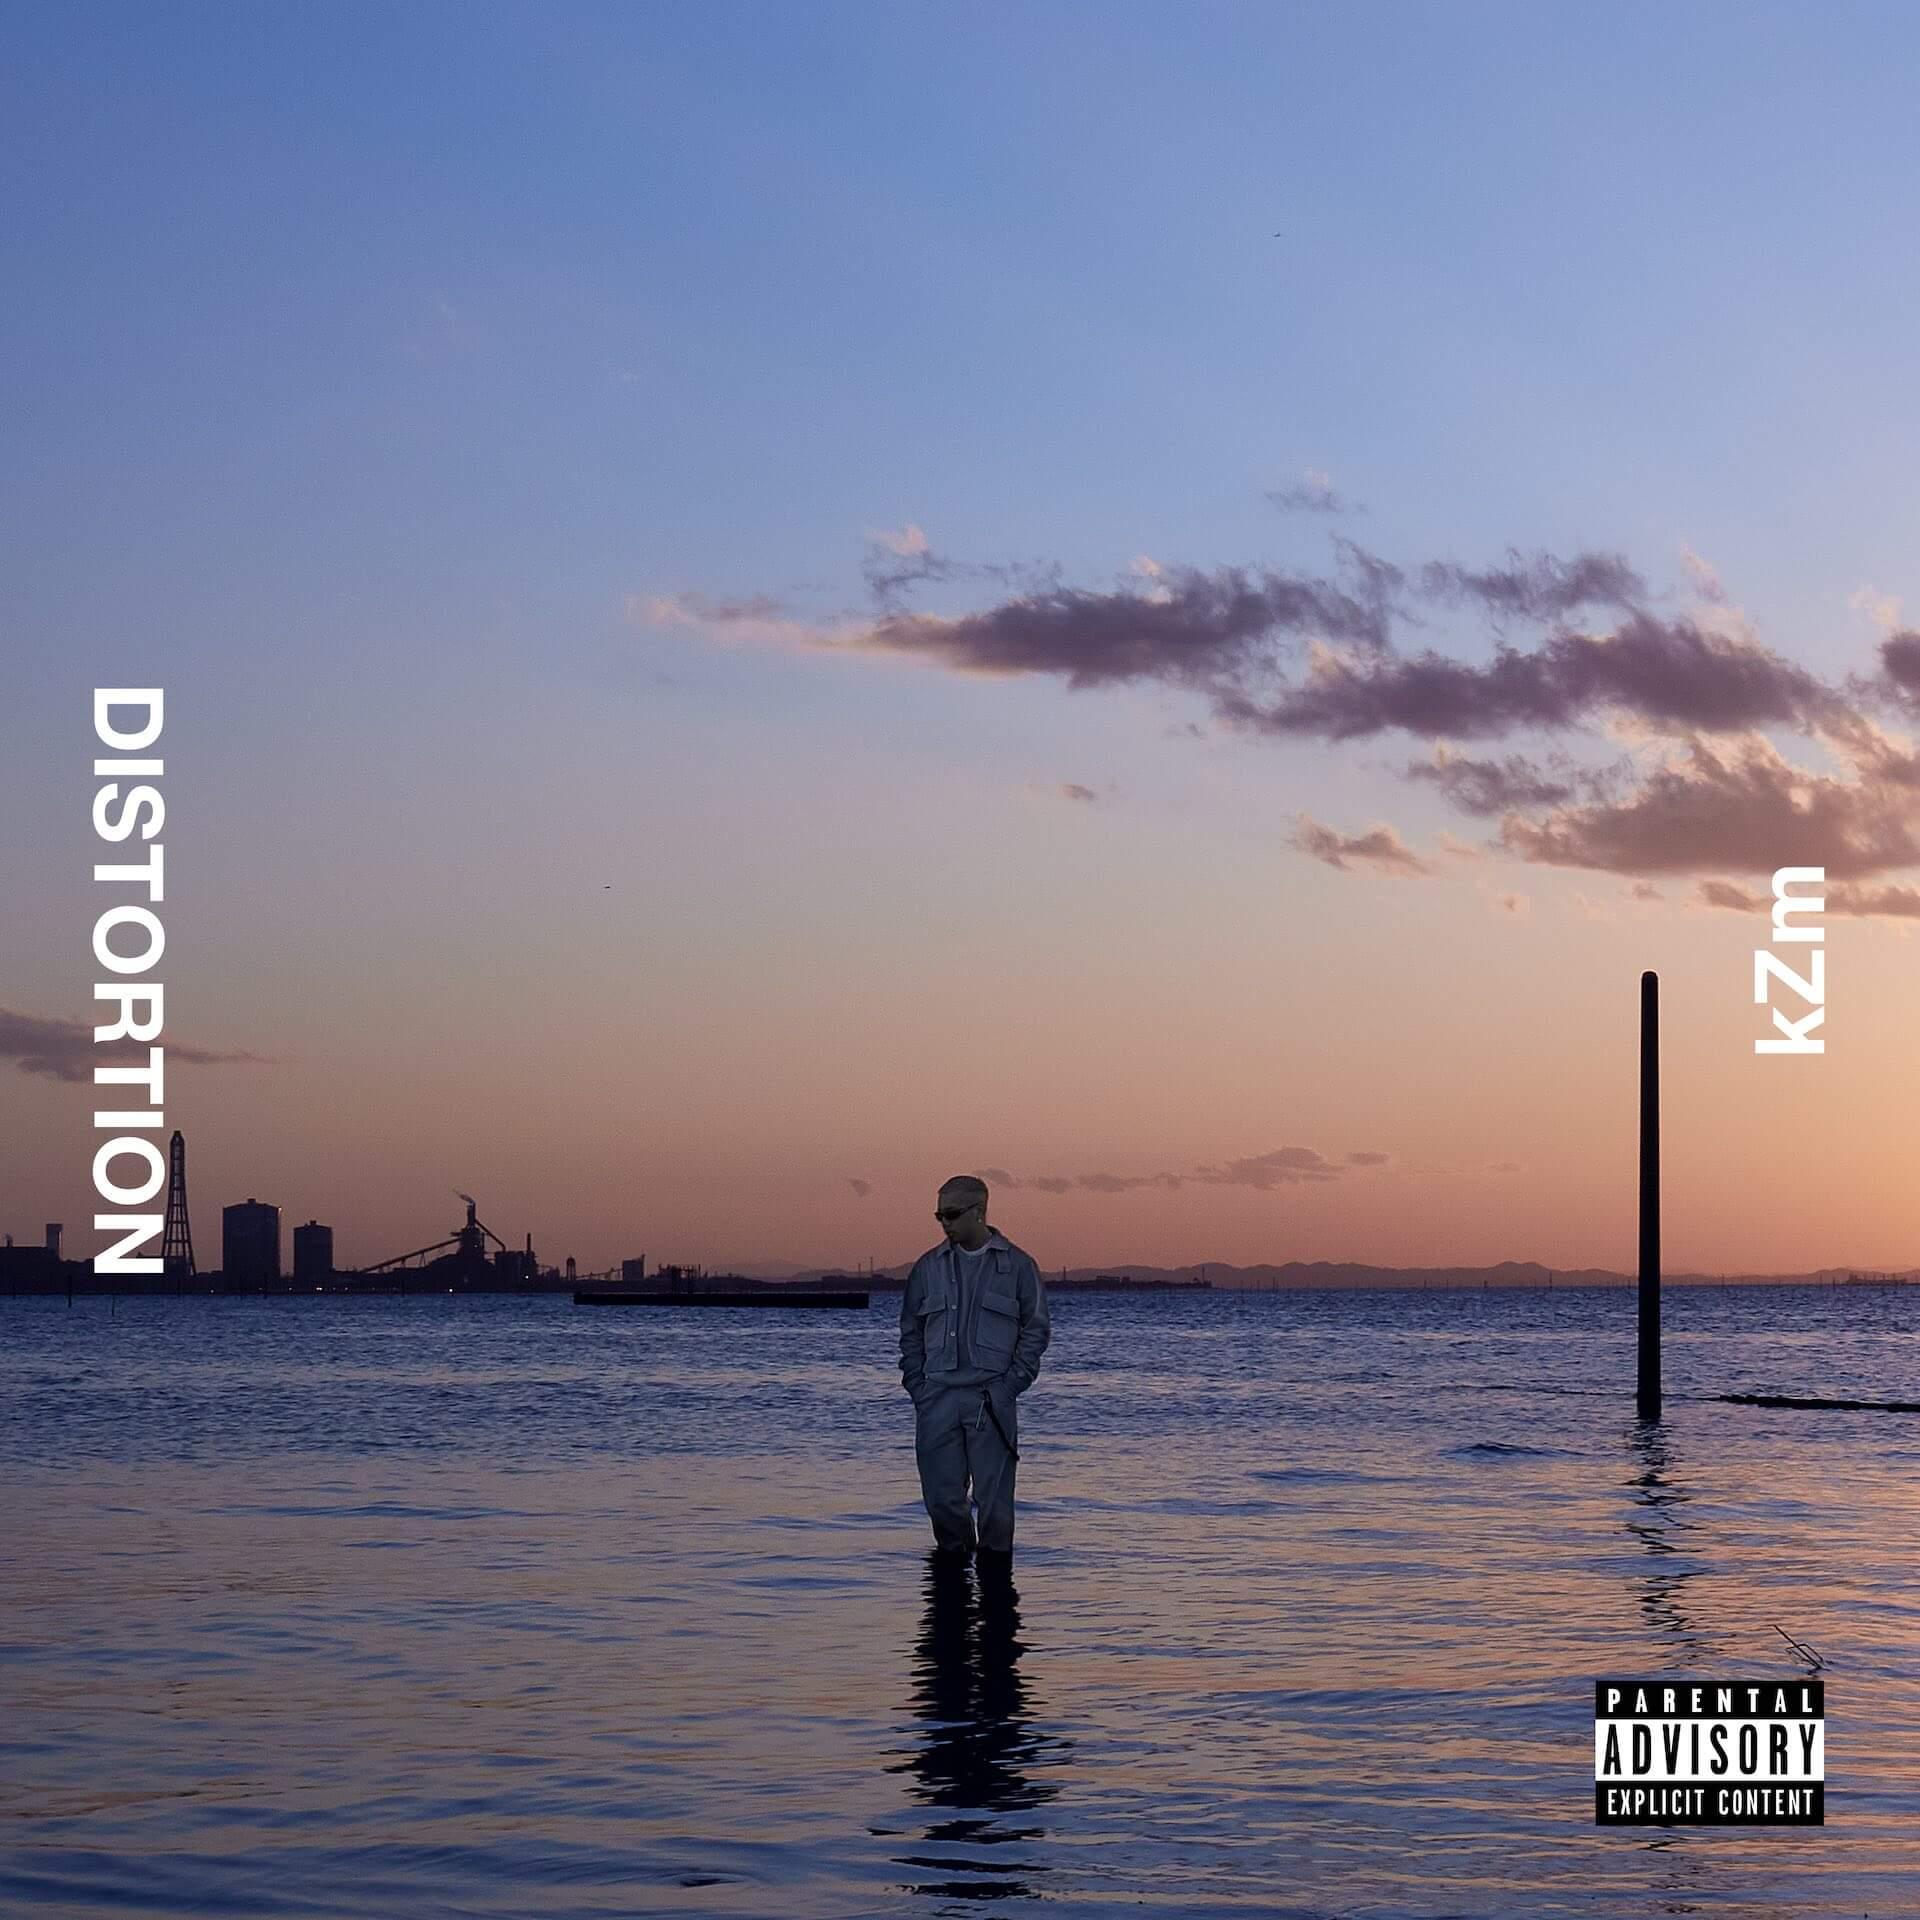 kZmの2ndアルバム『DISTORTION』豪華客演陣が発表!野田洋次郎、小袋成彬、Tohji、5lackらが集結 music200420_kzm2nd_02